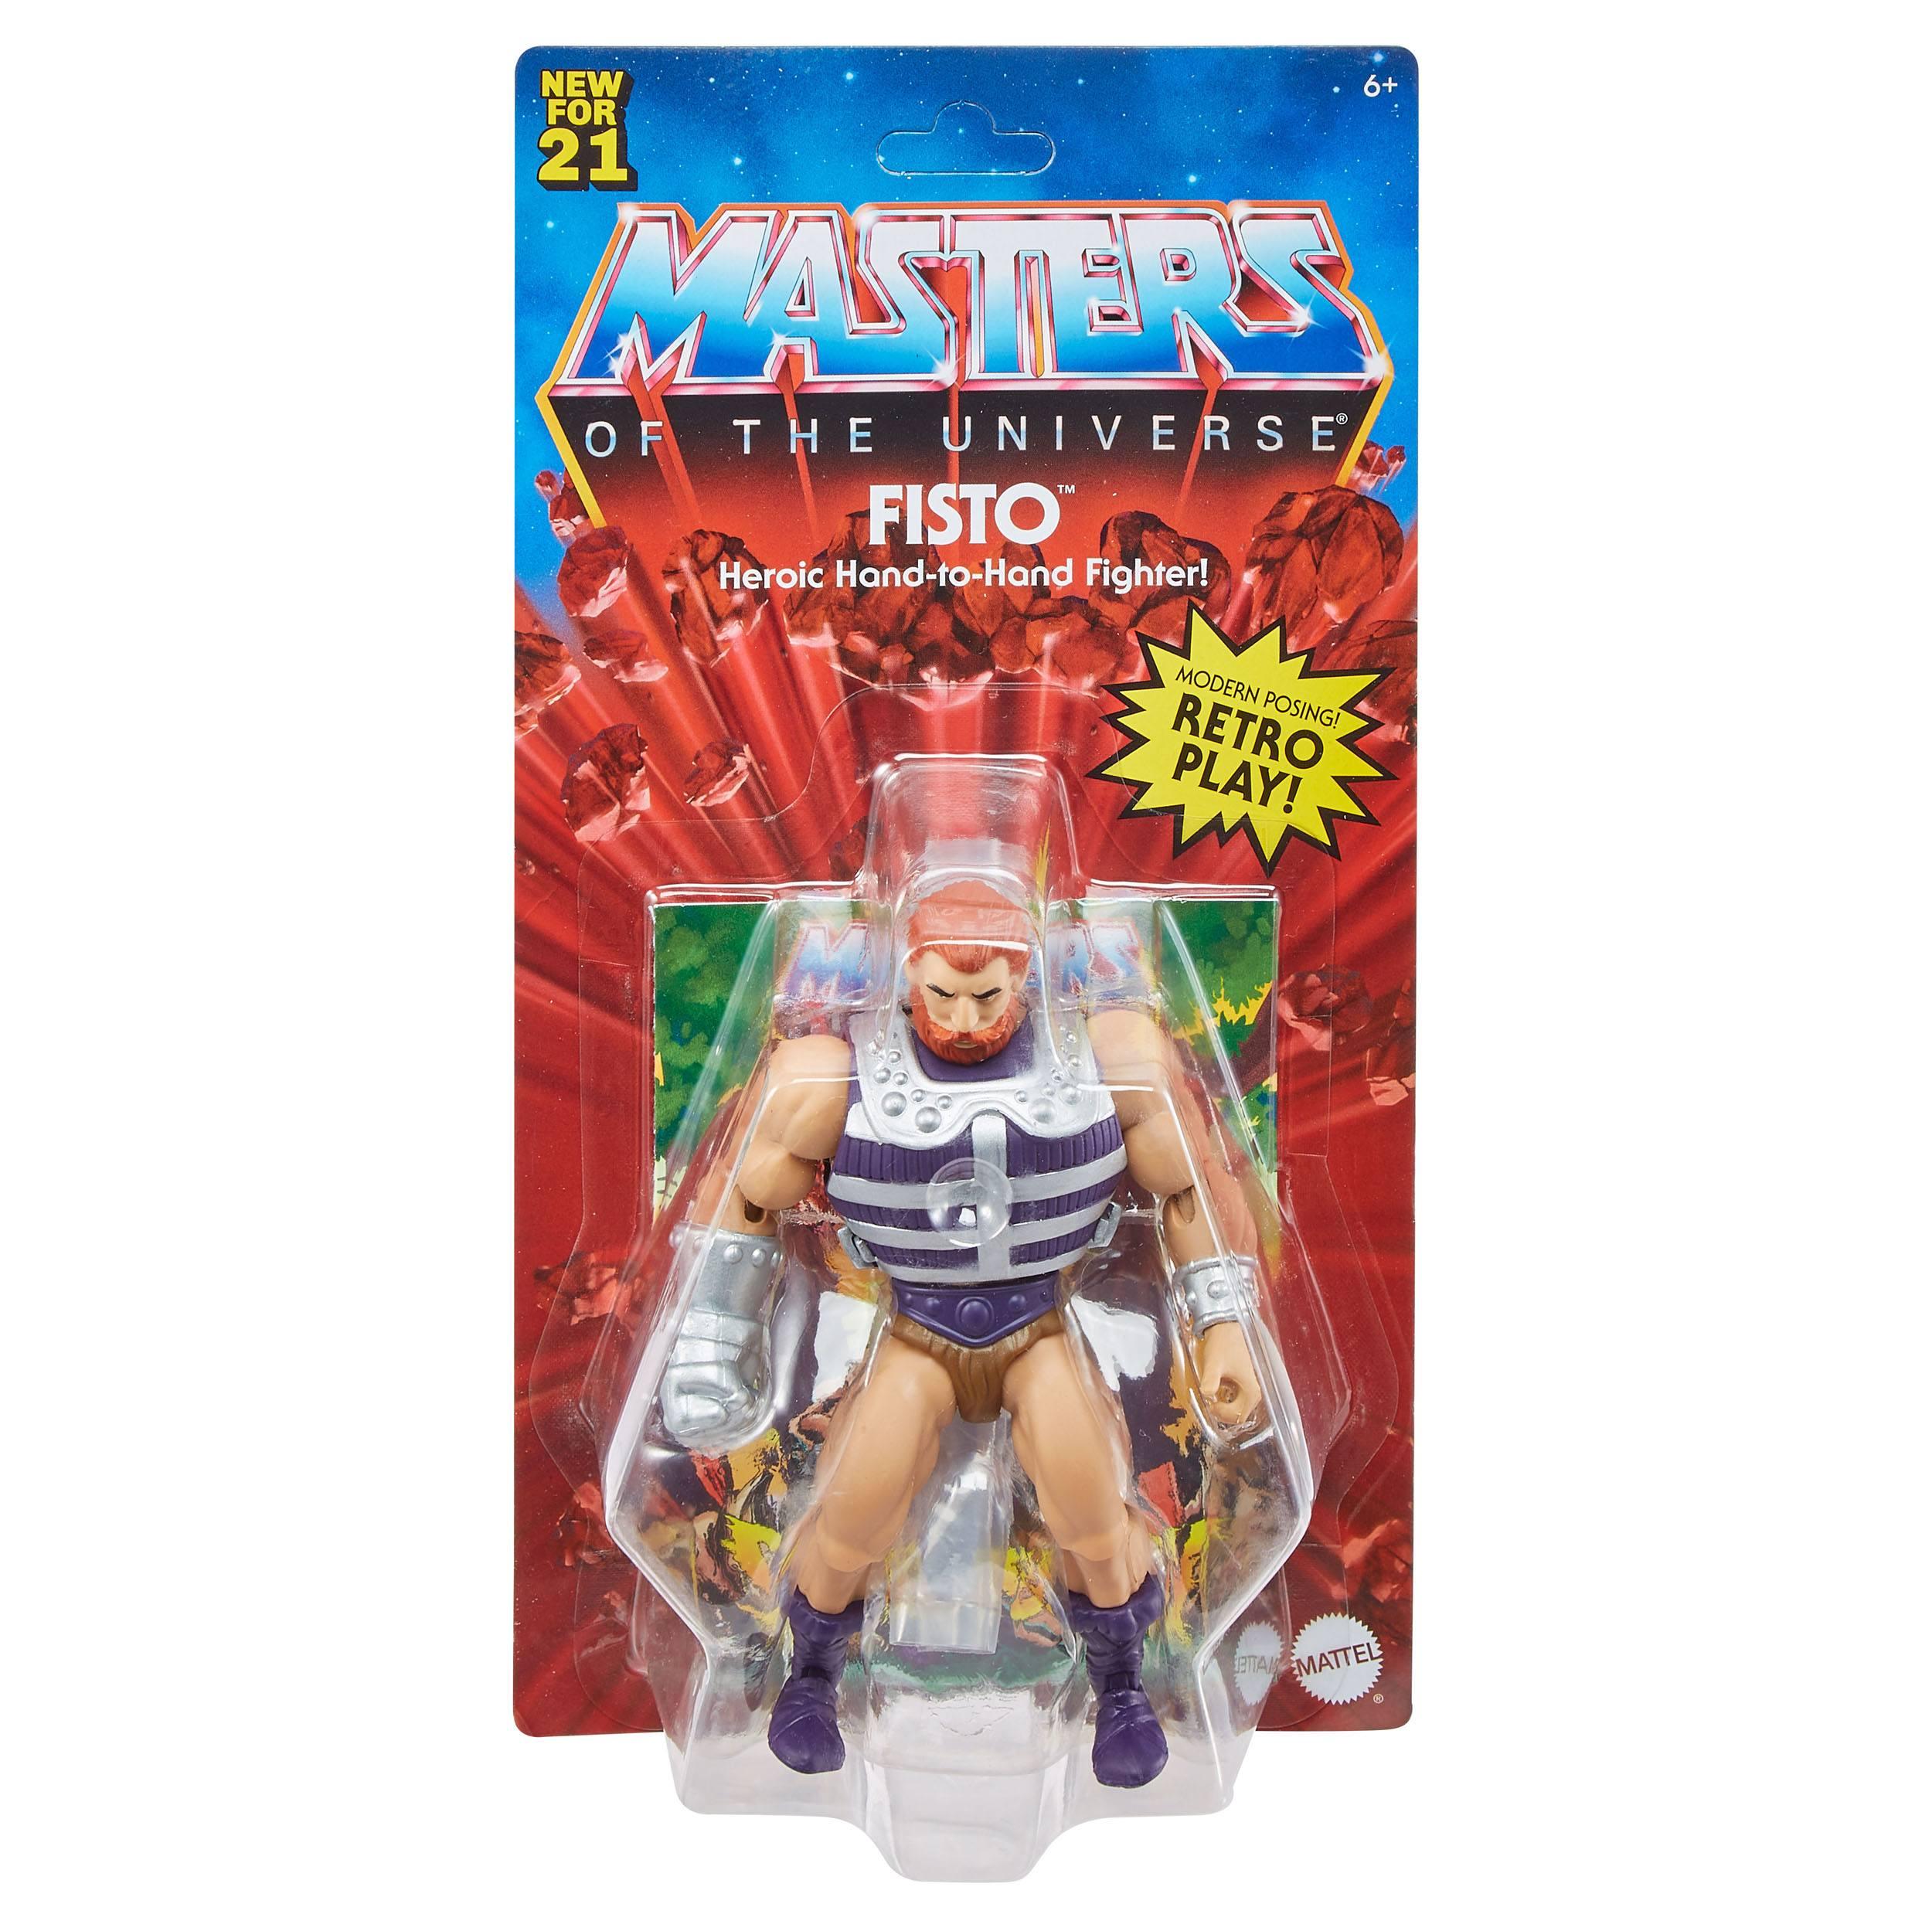 Masters of the Universe Origins Actionfigur 2021 Fisto 14 cm (EU Karte) GYY25 887961982756